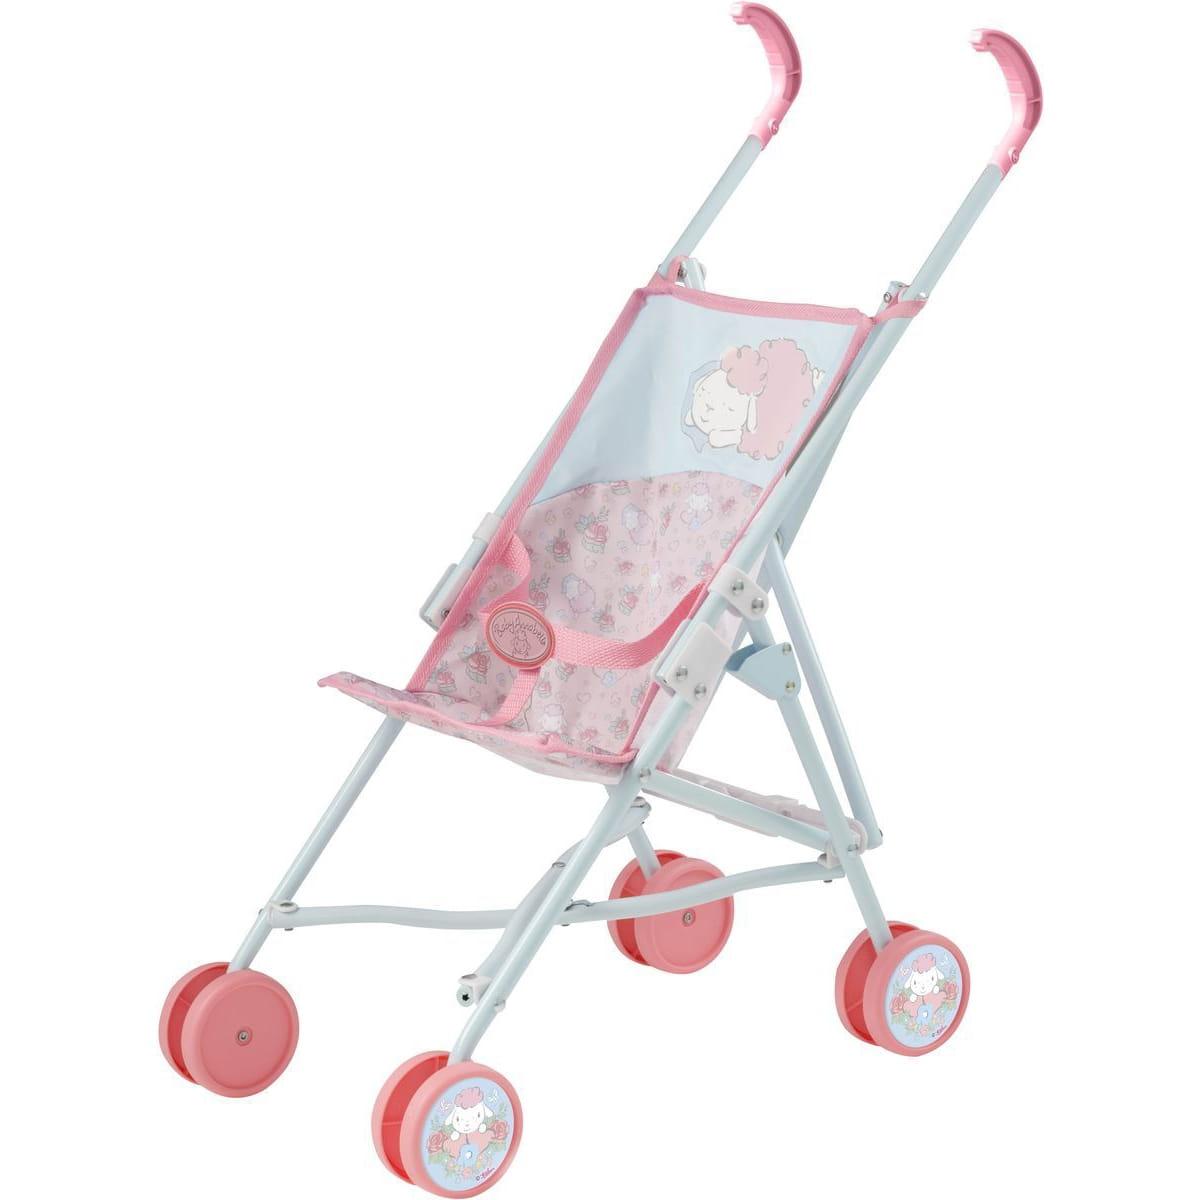 Коляска-трость для Baby Annabell 2017 (Zapf Creation)